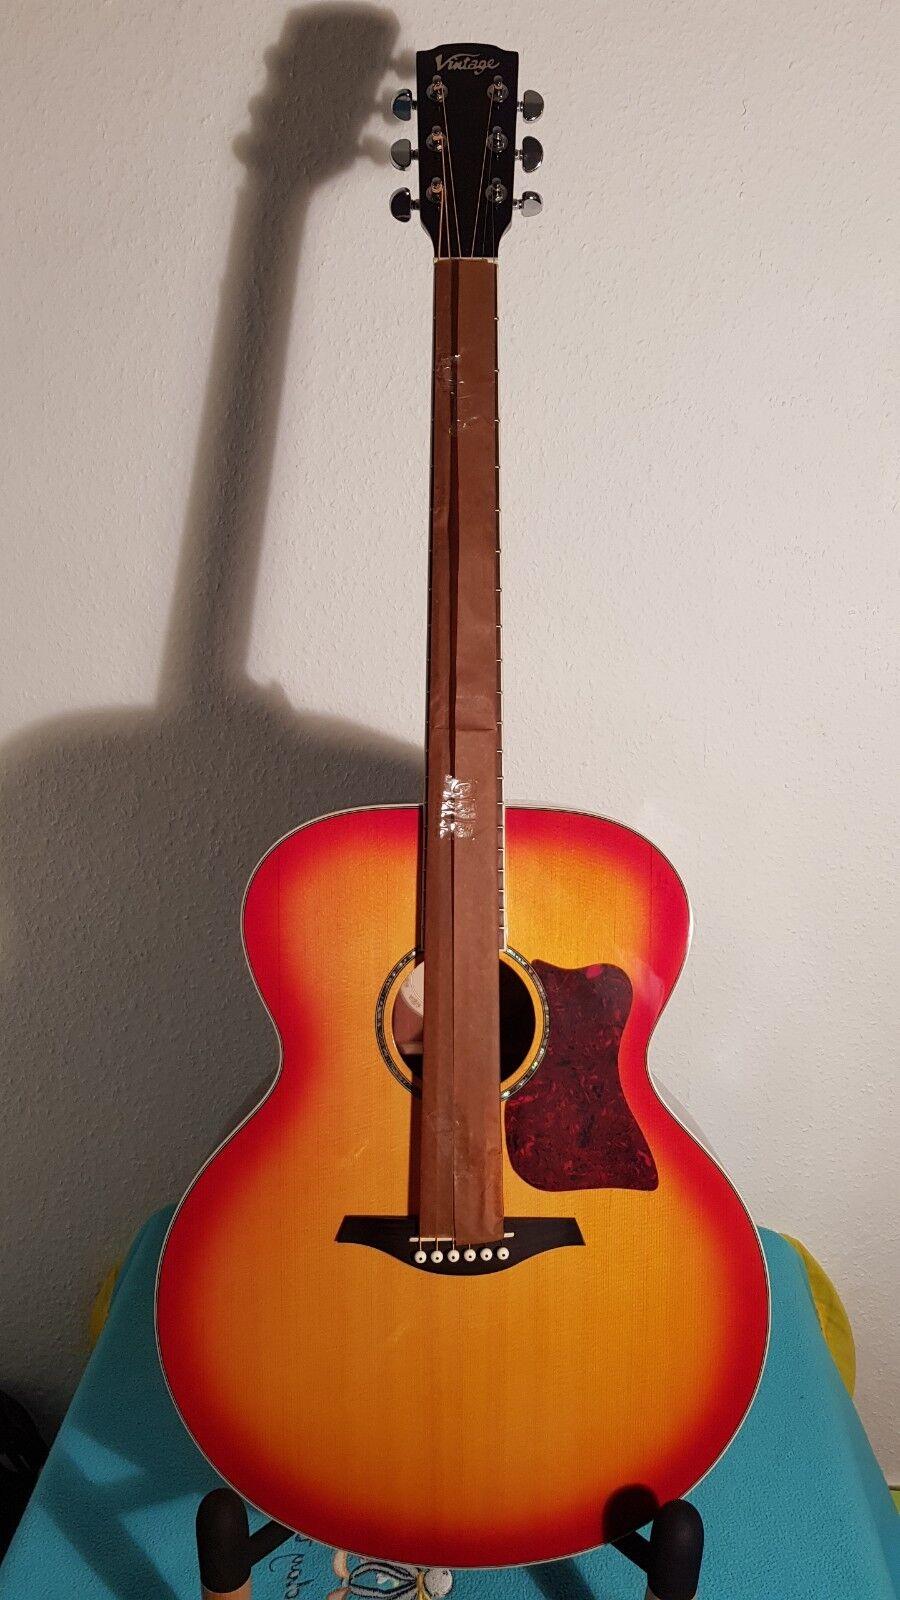 Guitarra Guitarra Guitarra Acústica  Jumbo  VJ100CSB por Vintage (VJ1 001)  estilo clásico